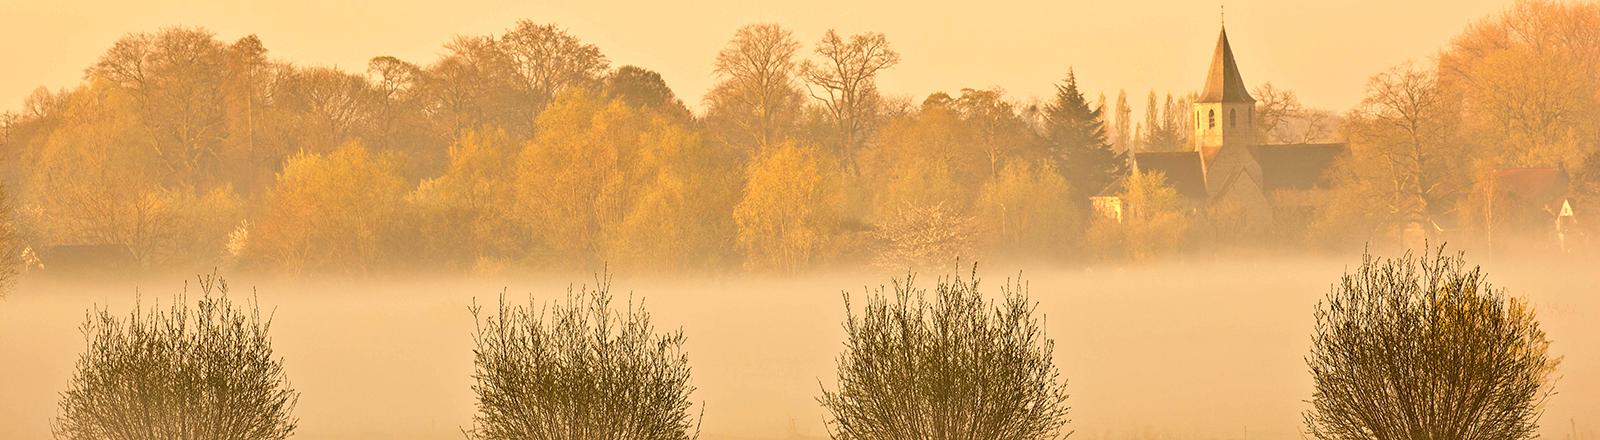 Dorf in Flandern im Nebel